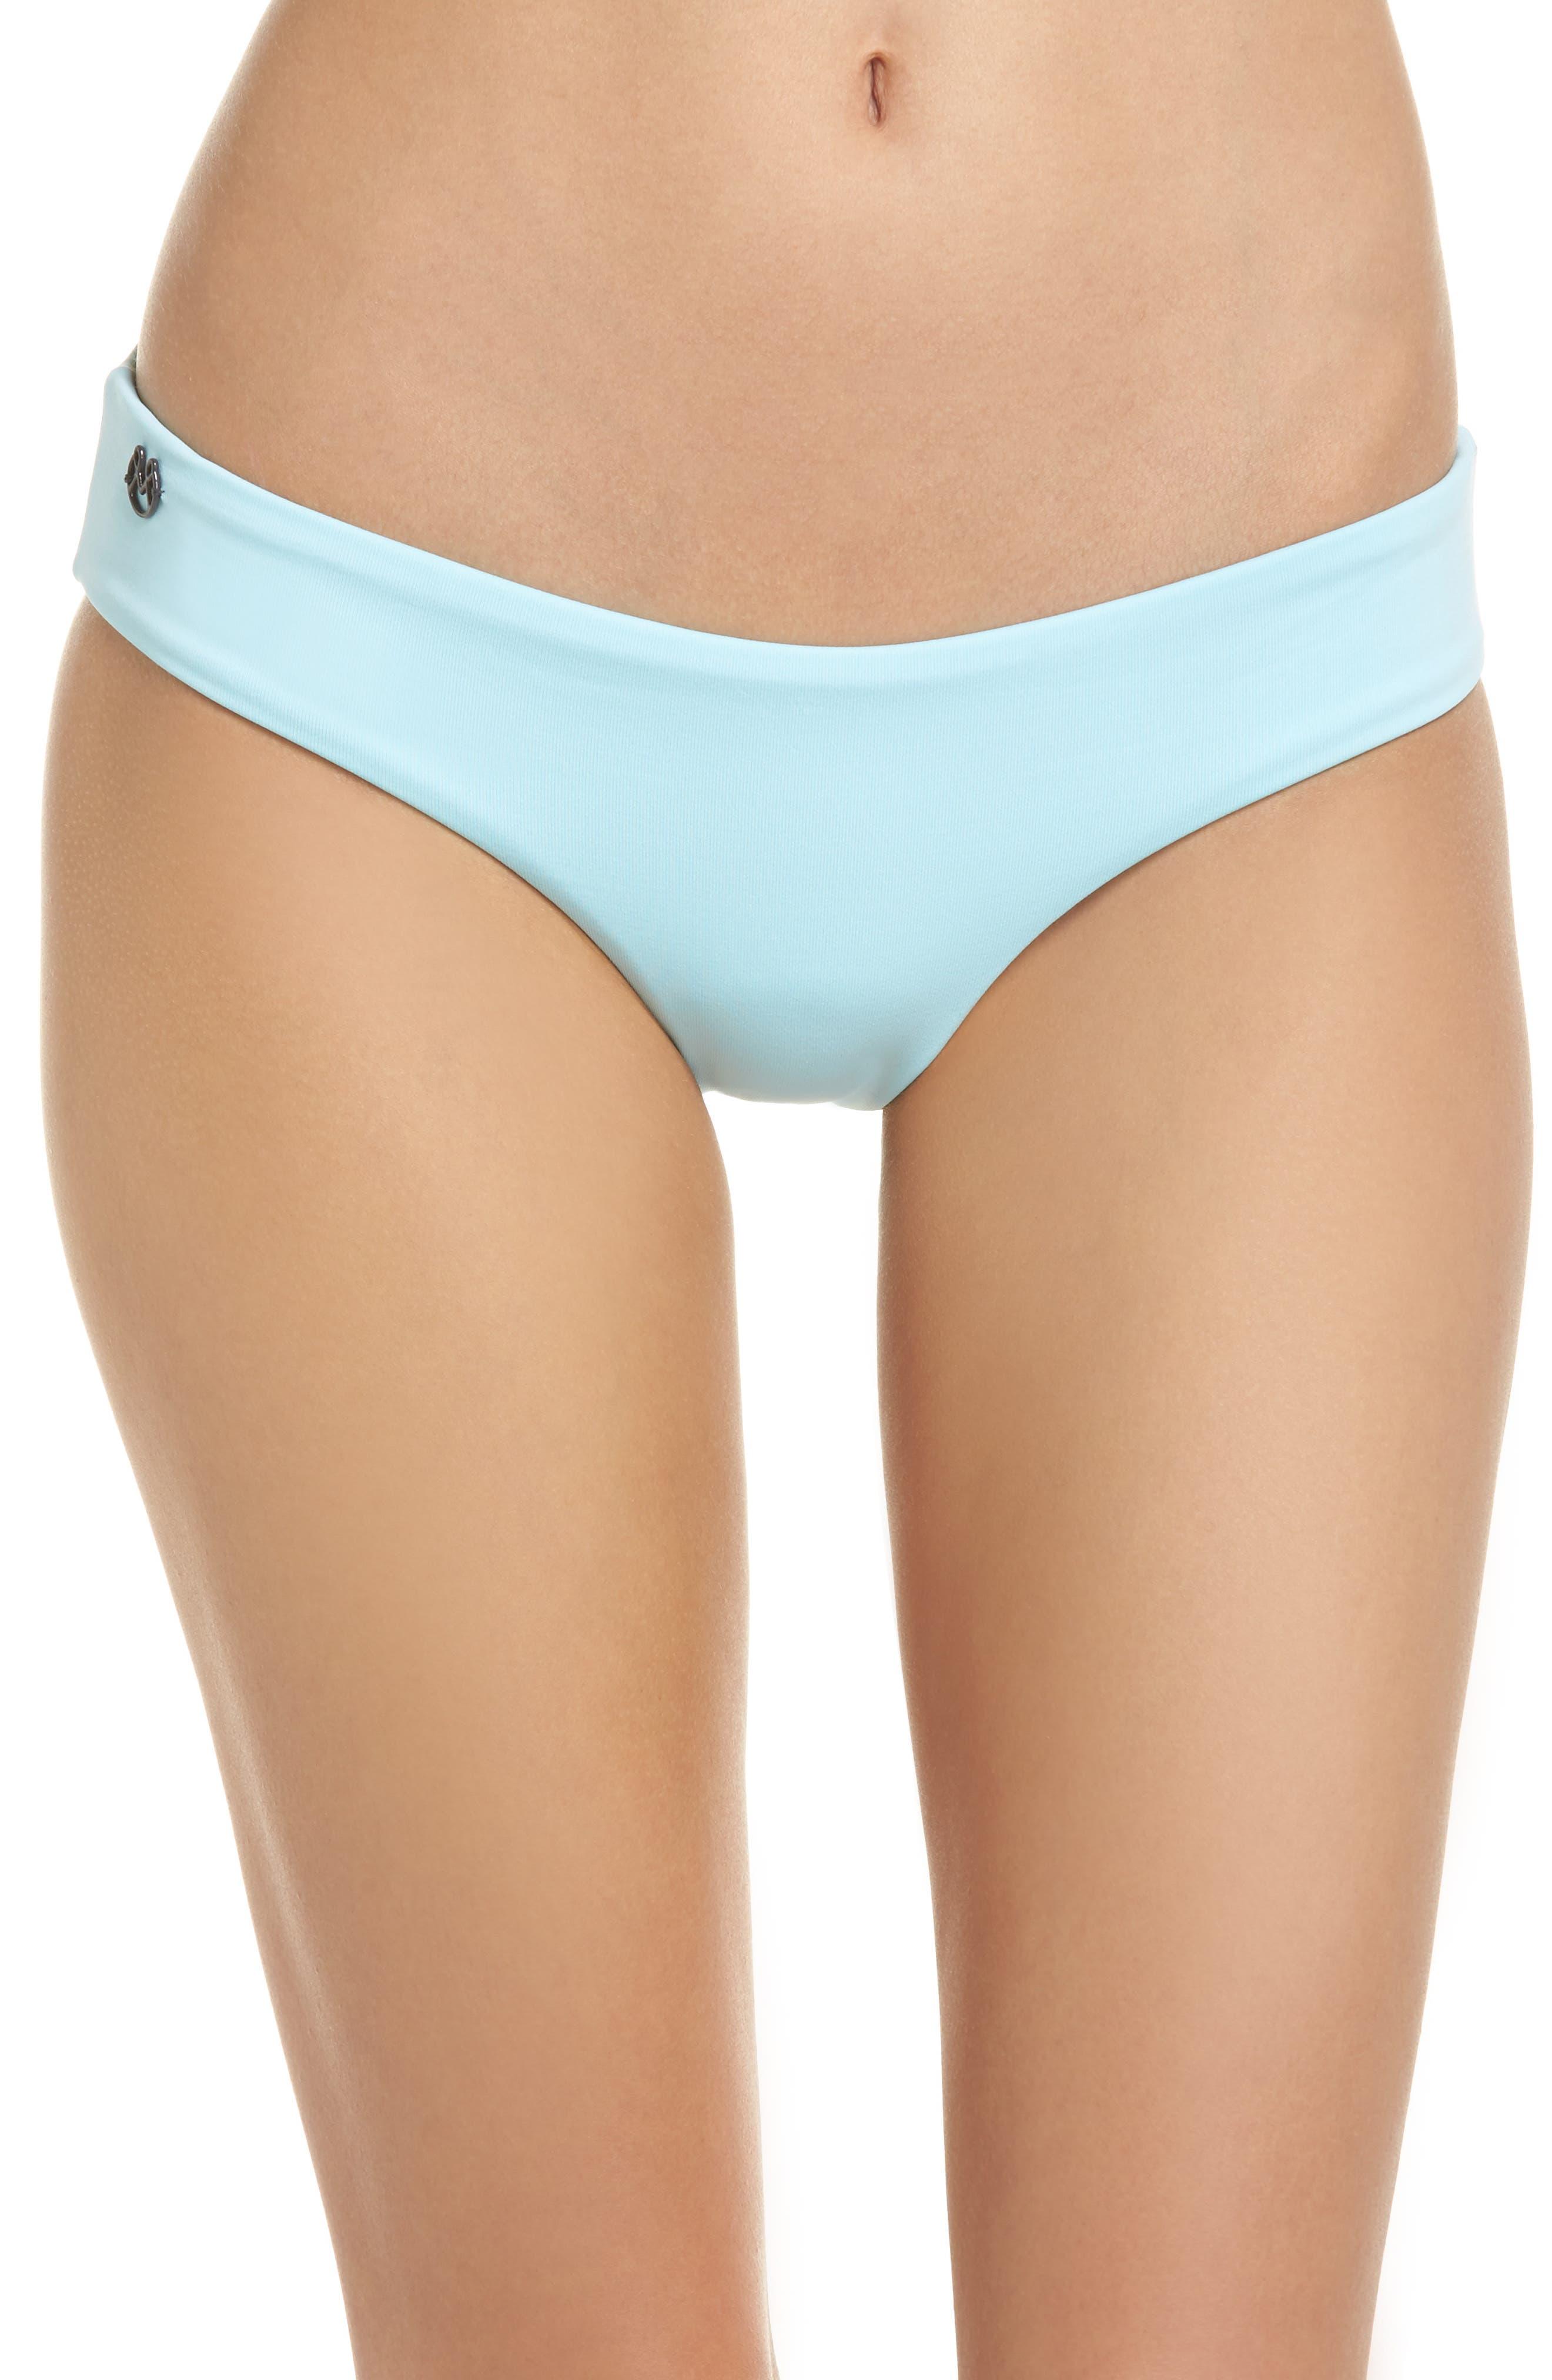 Crystal Blue Sublime Signature Reversible Bikini Bottoms,                             Main thumbnail 1, color,                             450